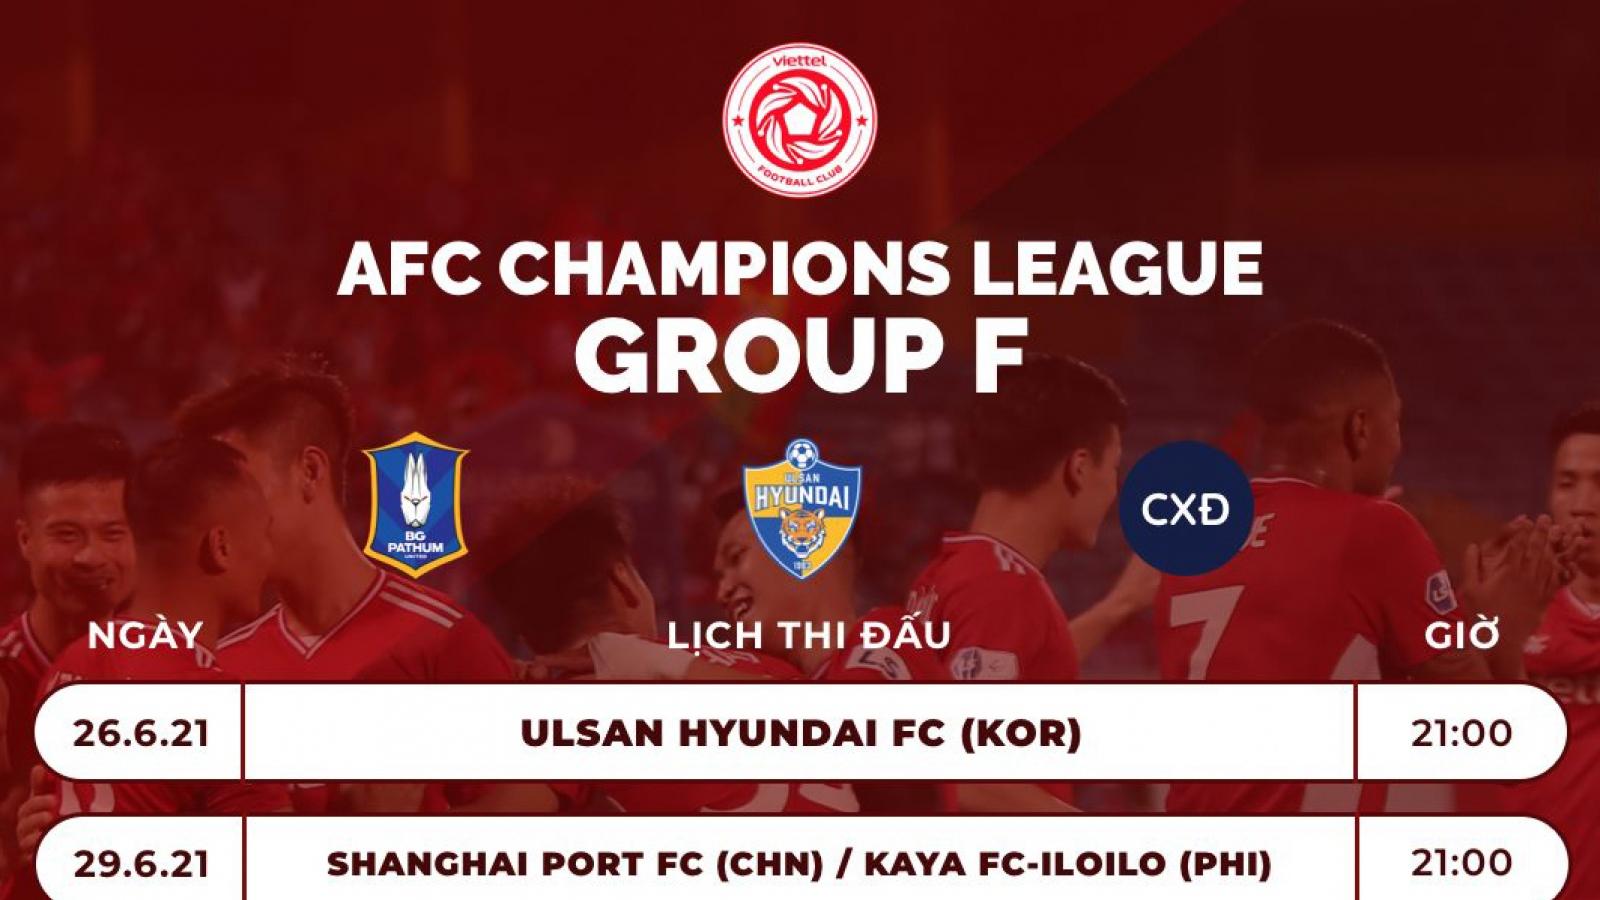 Lịch thi đấu của Viettel ở AFC Champions League 2021